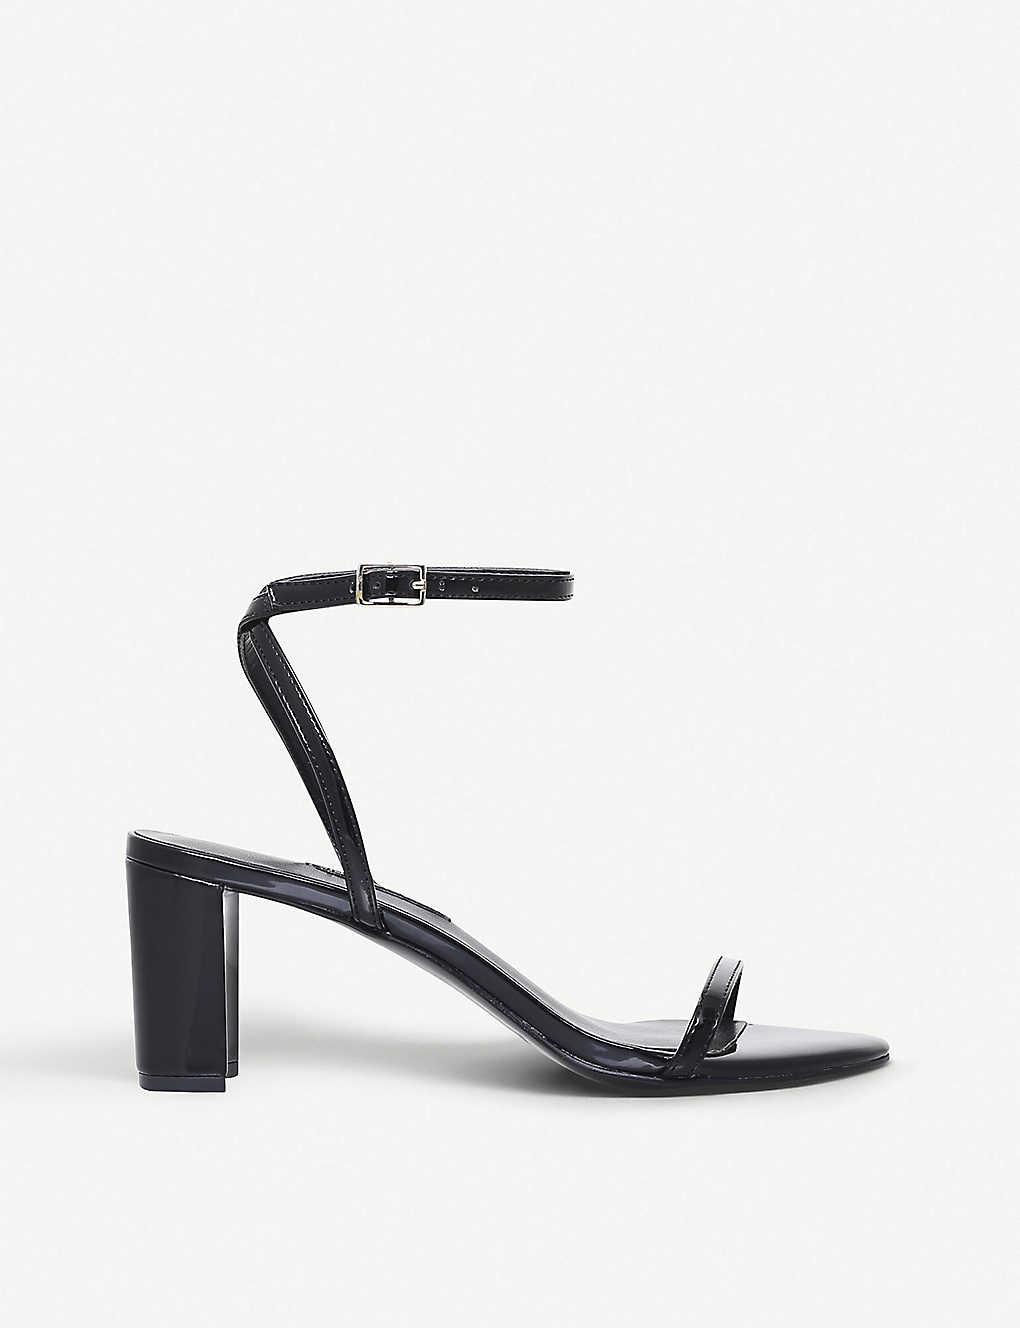 73c0b718b50 NINE WEST - Provein two-part heeled sandals